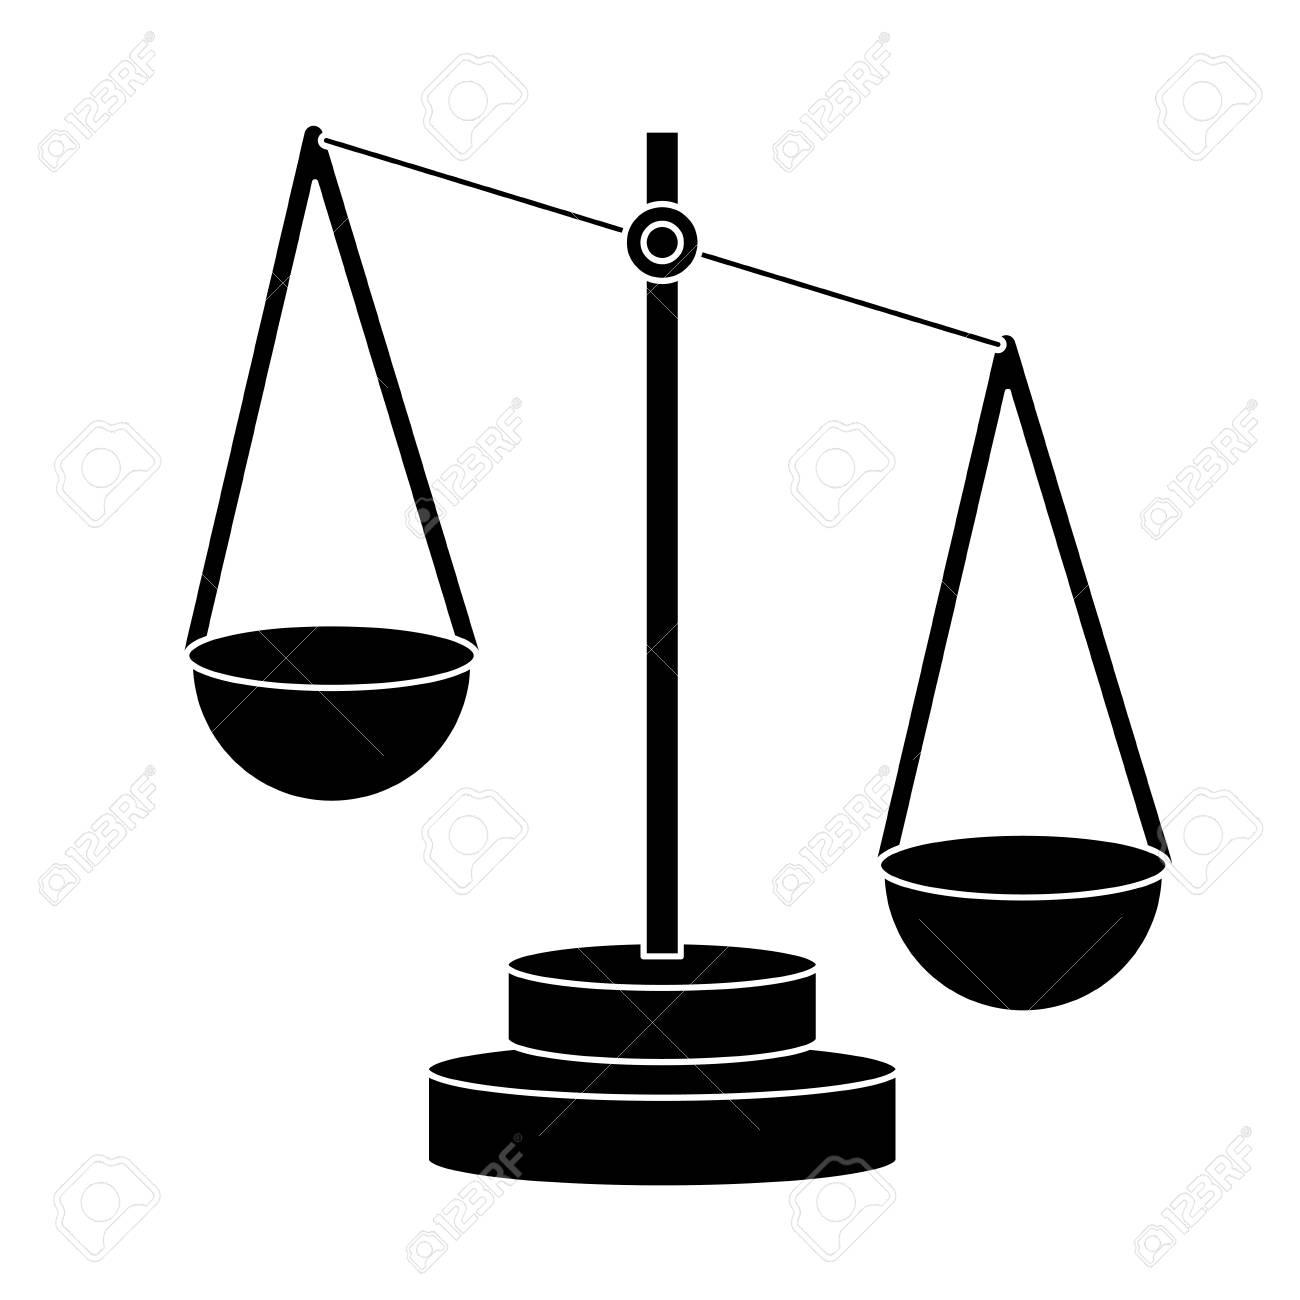 Balance Justice justice balance symbol icon vector illustration graphic design